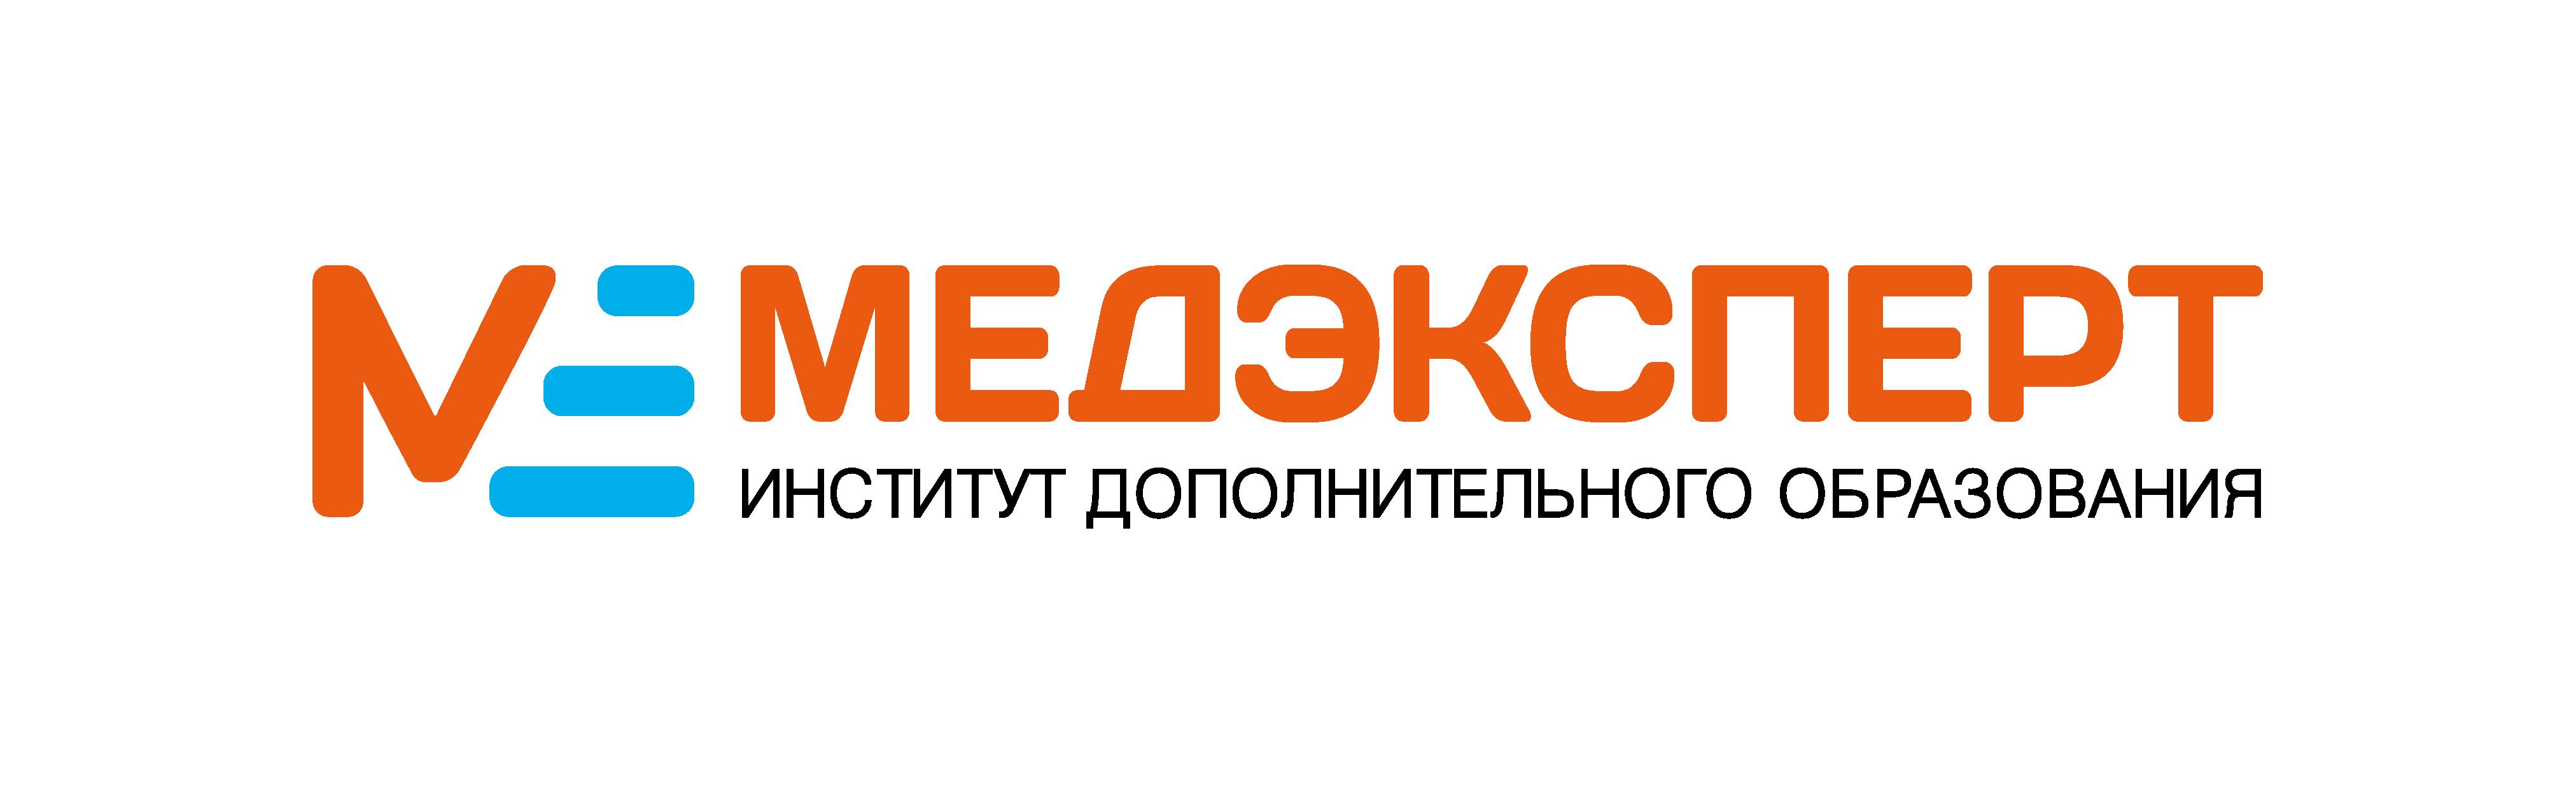 Медэксперт